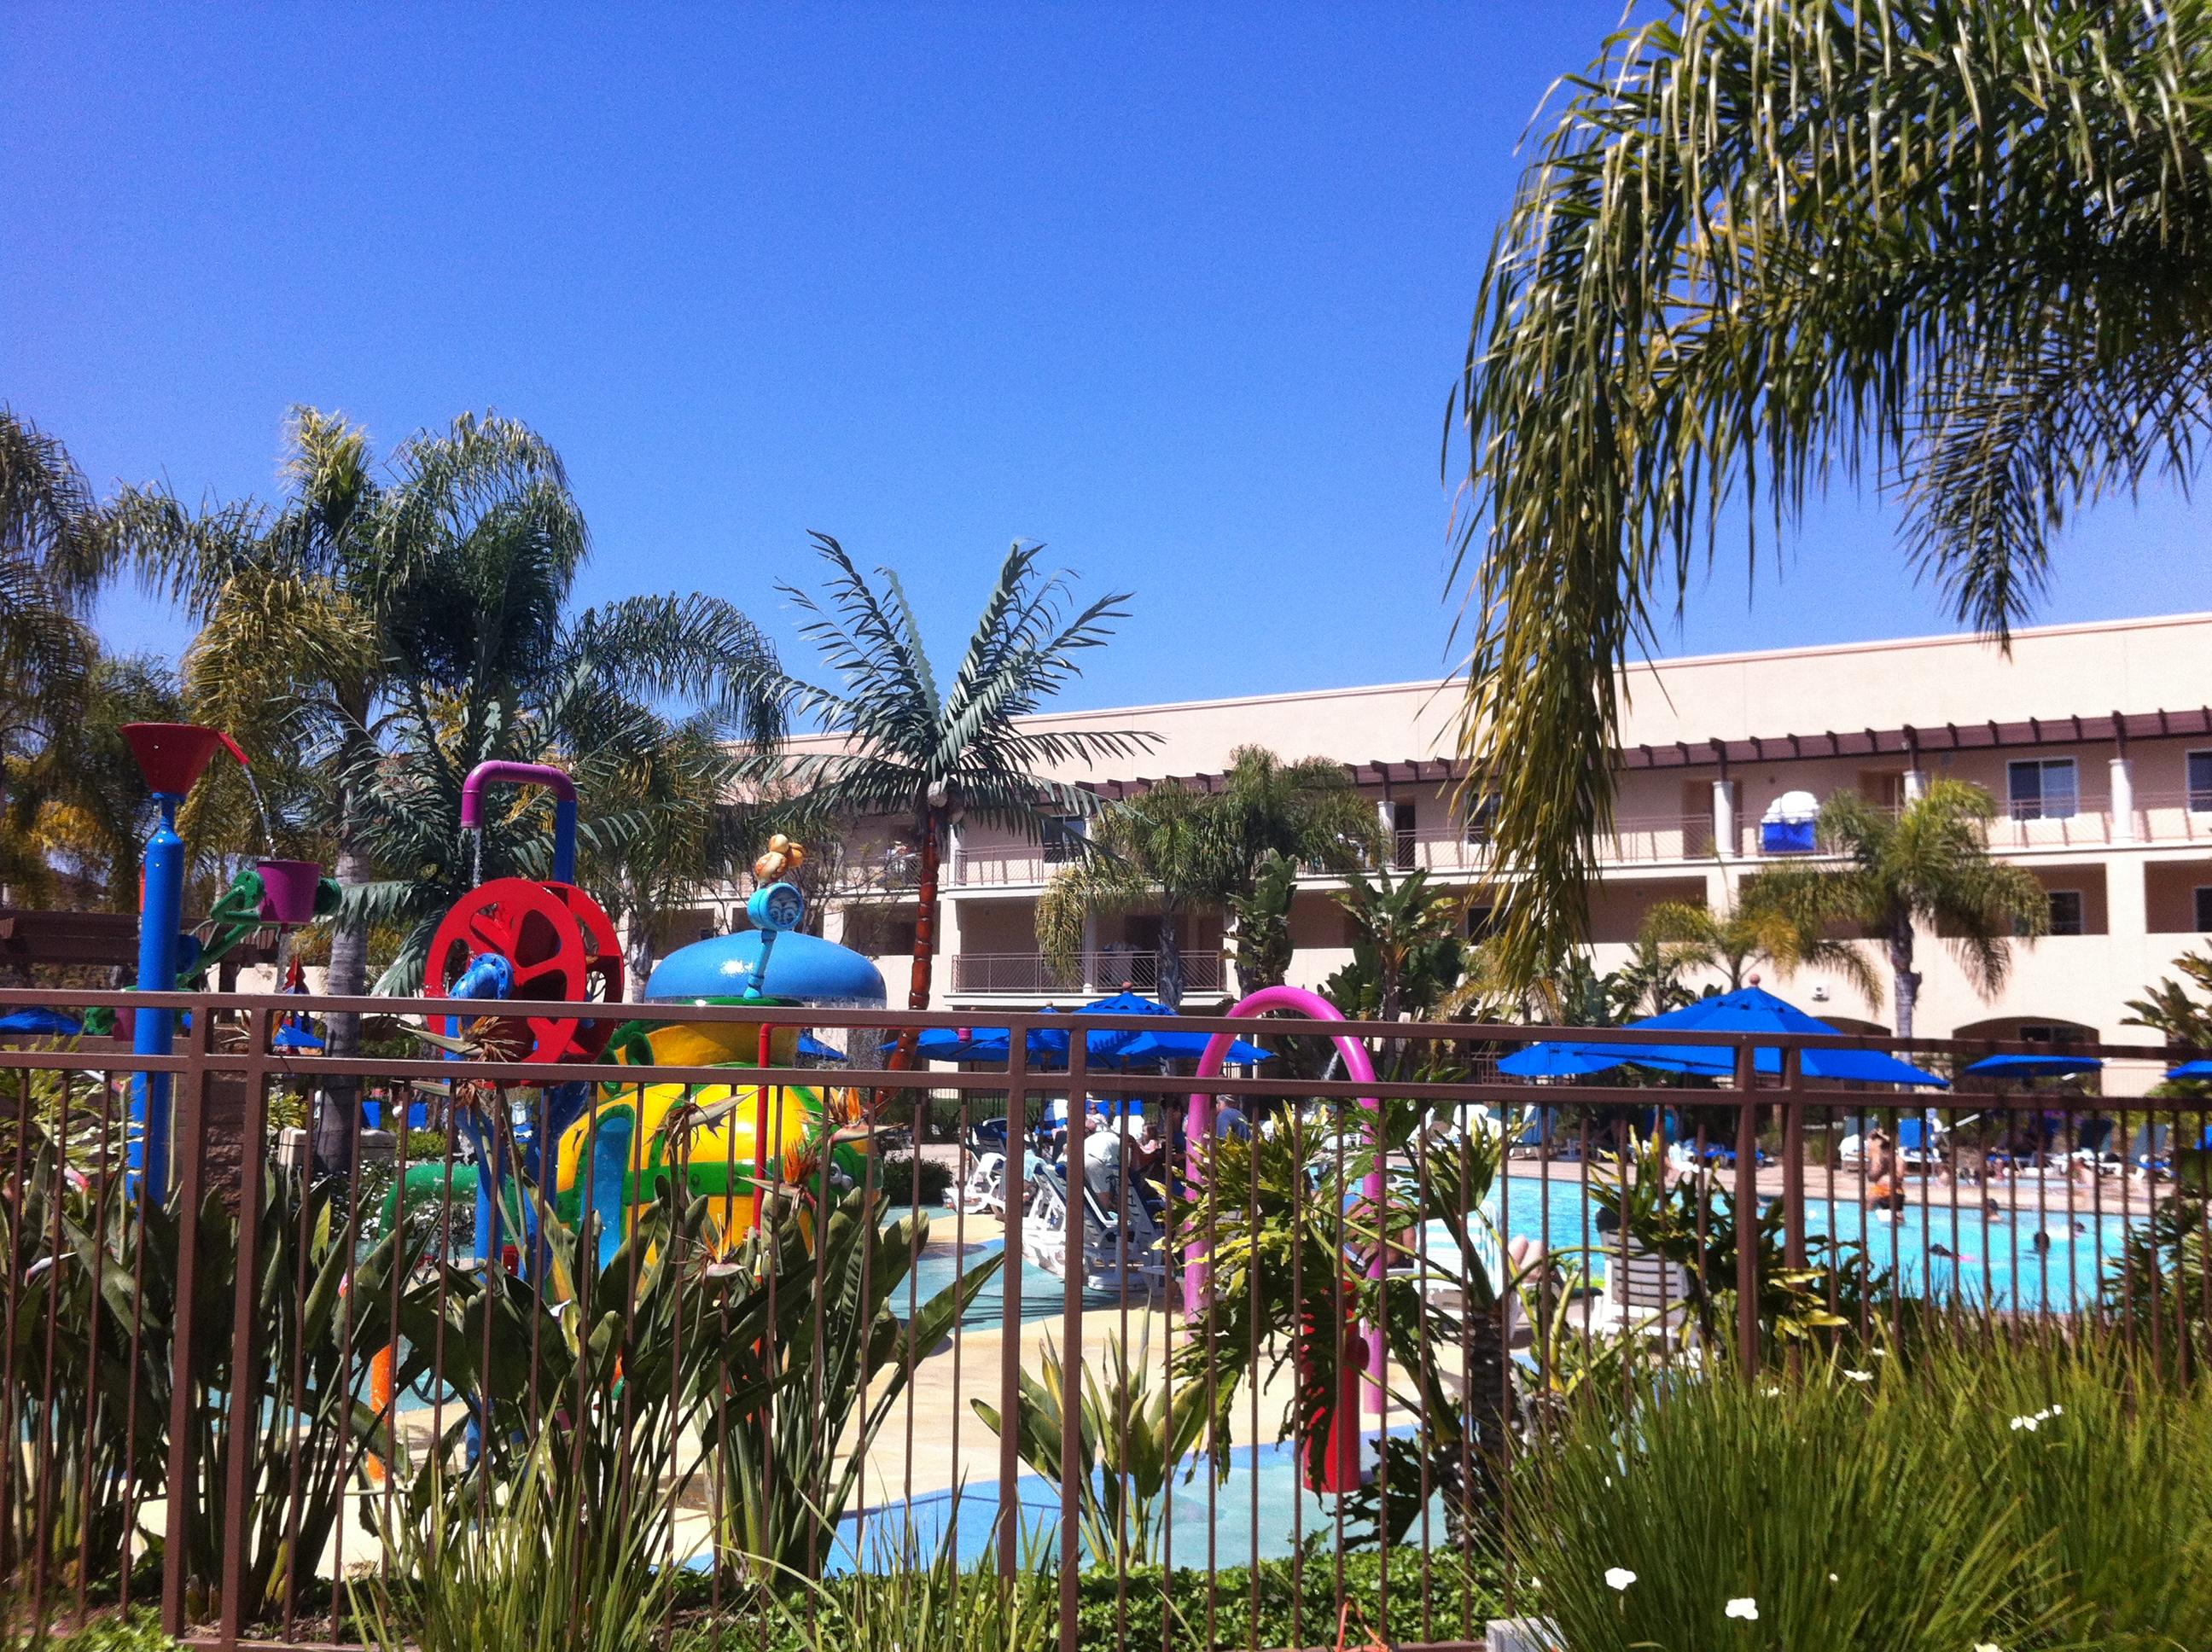 Grand Pacific Palisades Resort and Hotel ... - TripAdvisor